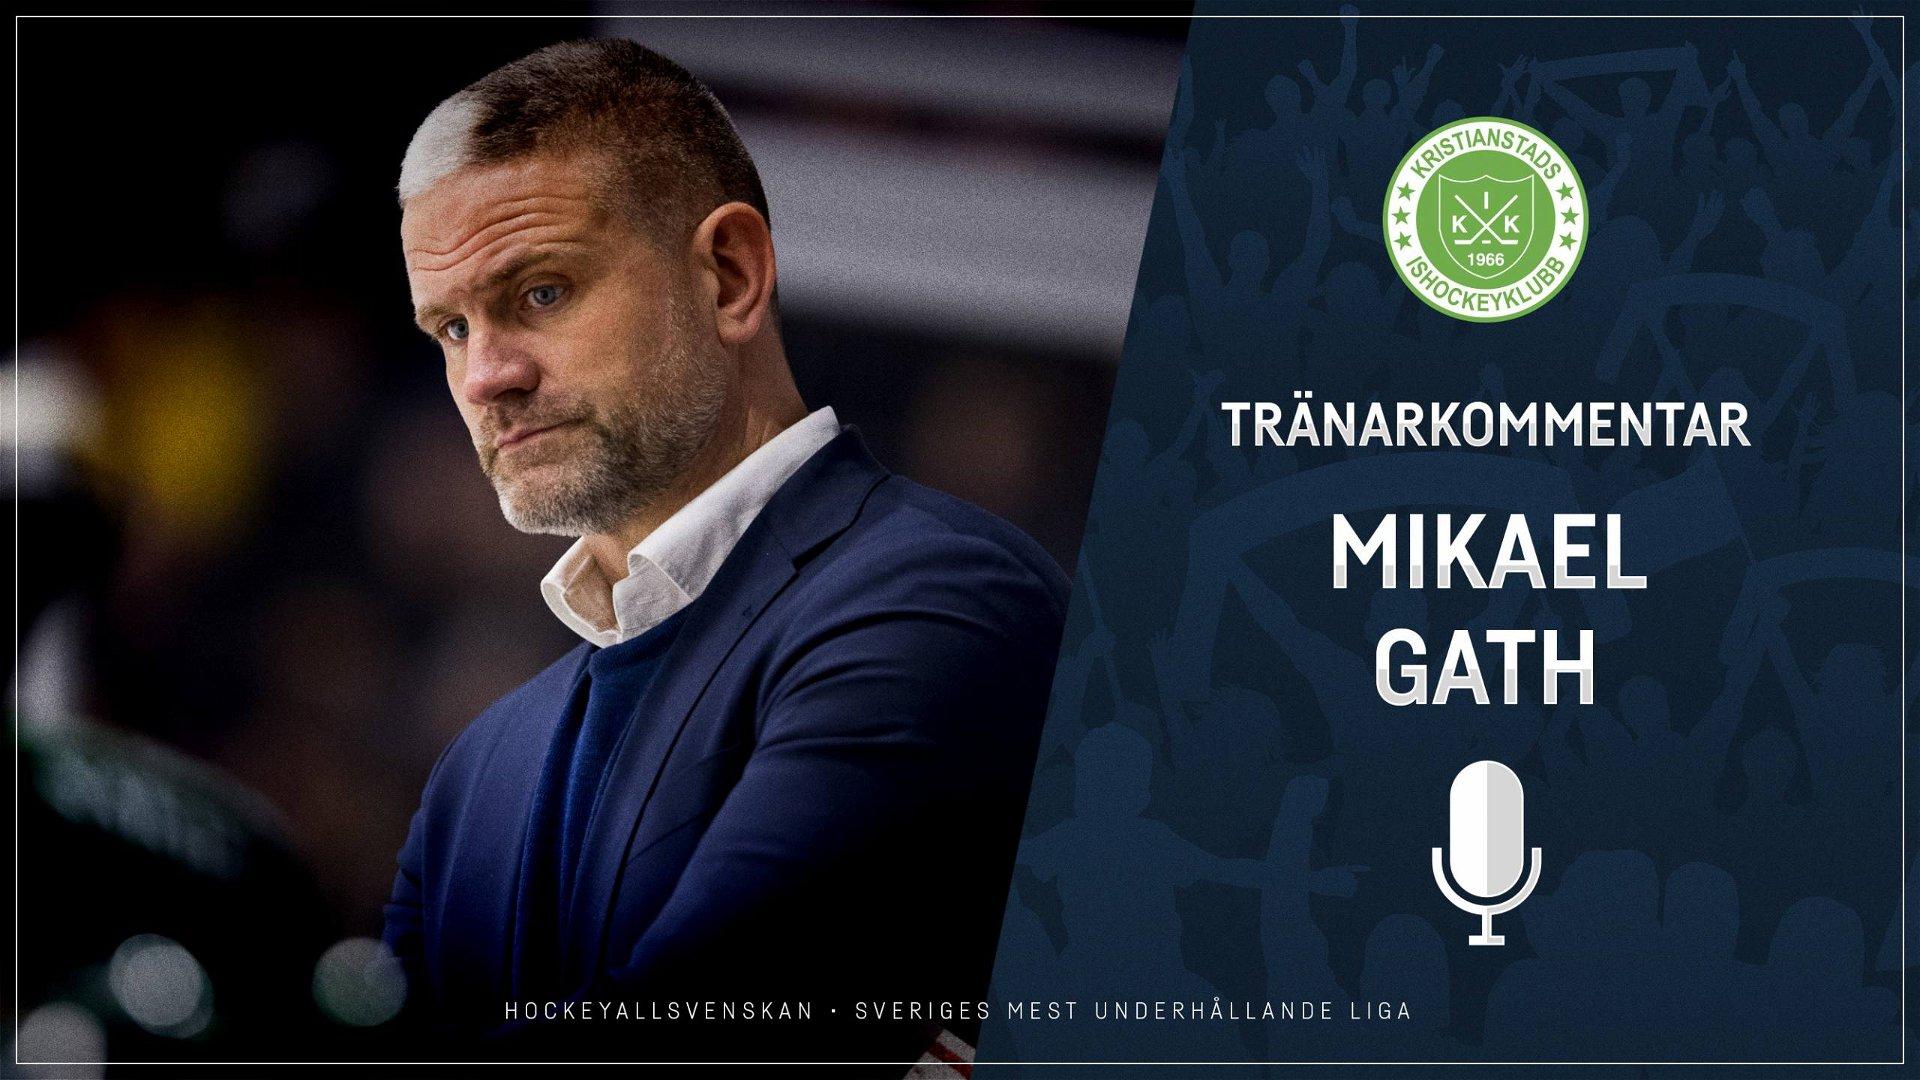 2021-02-26 Segerintervju: Mikael Gath